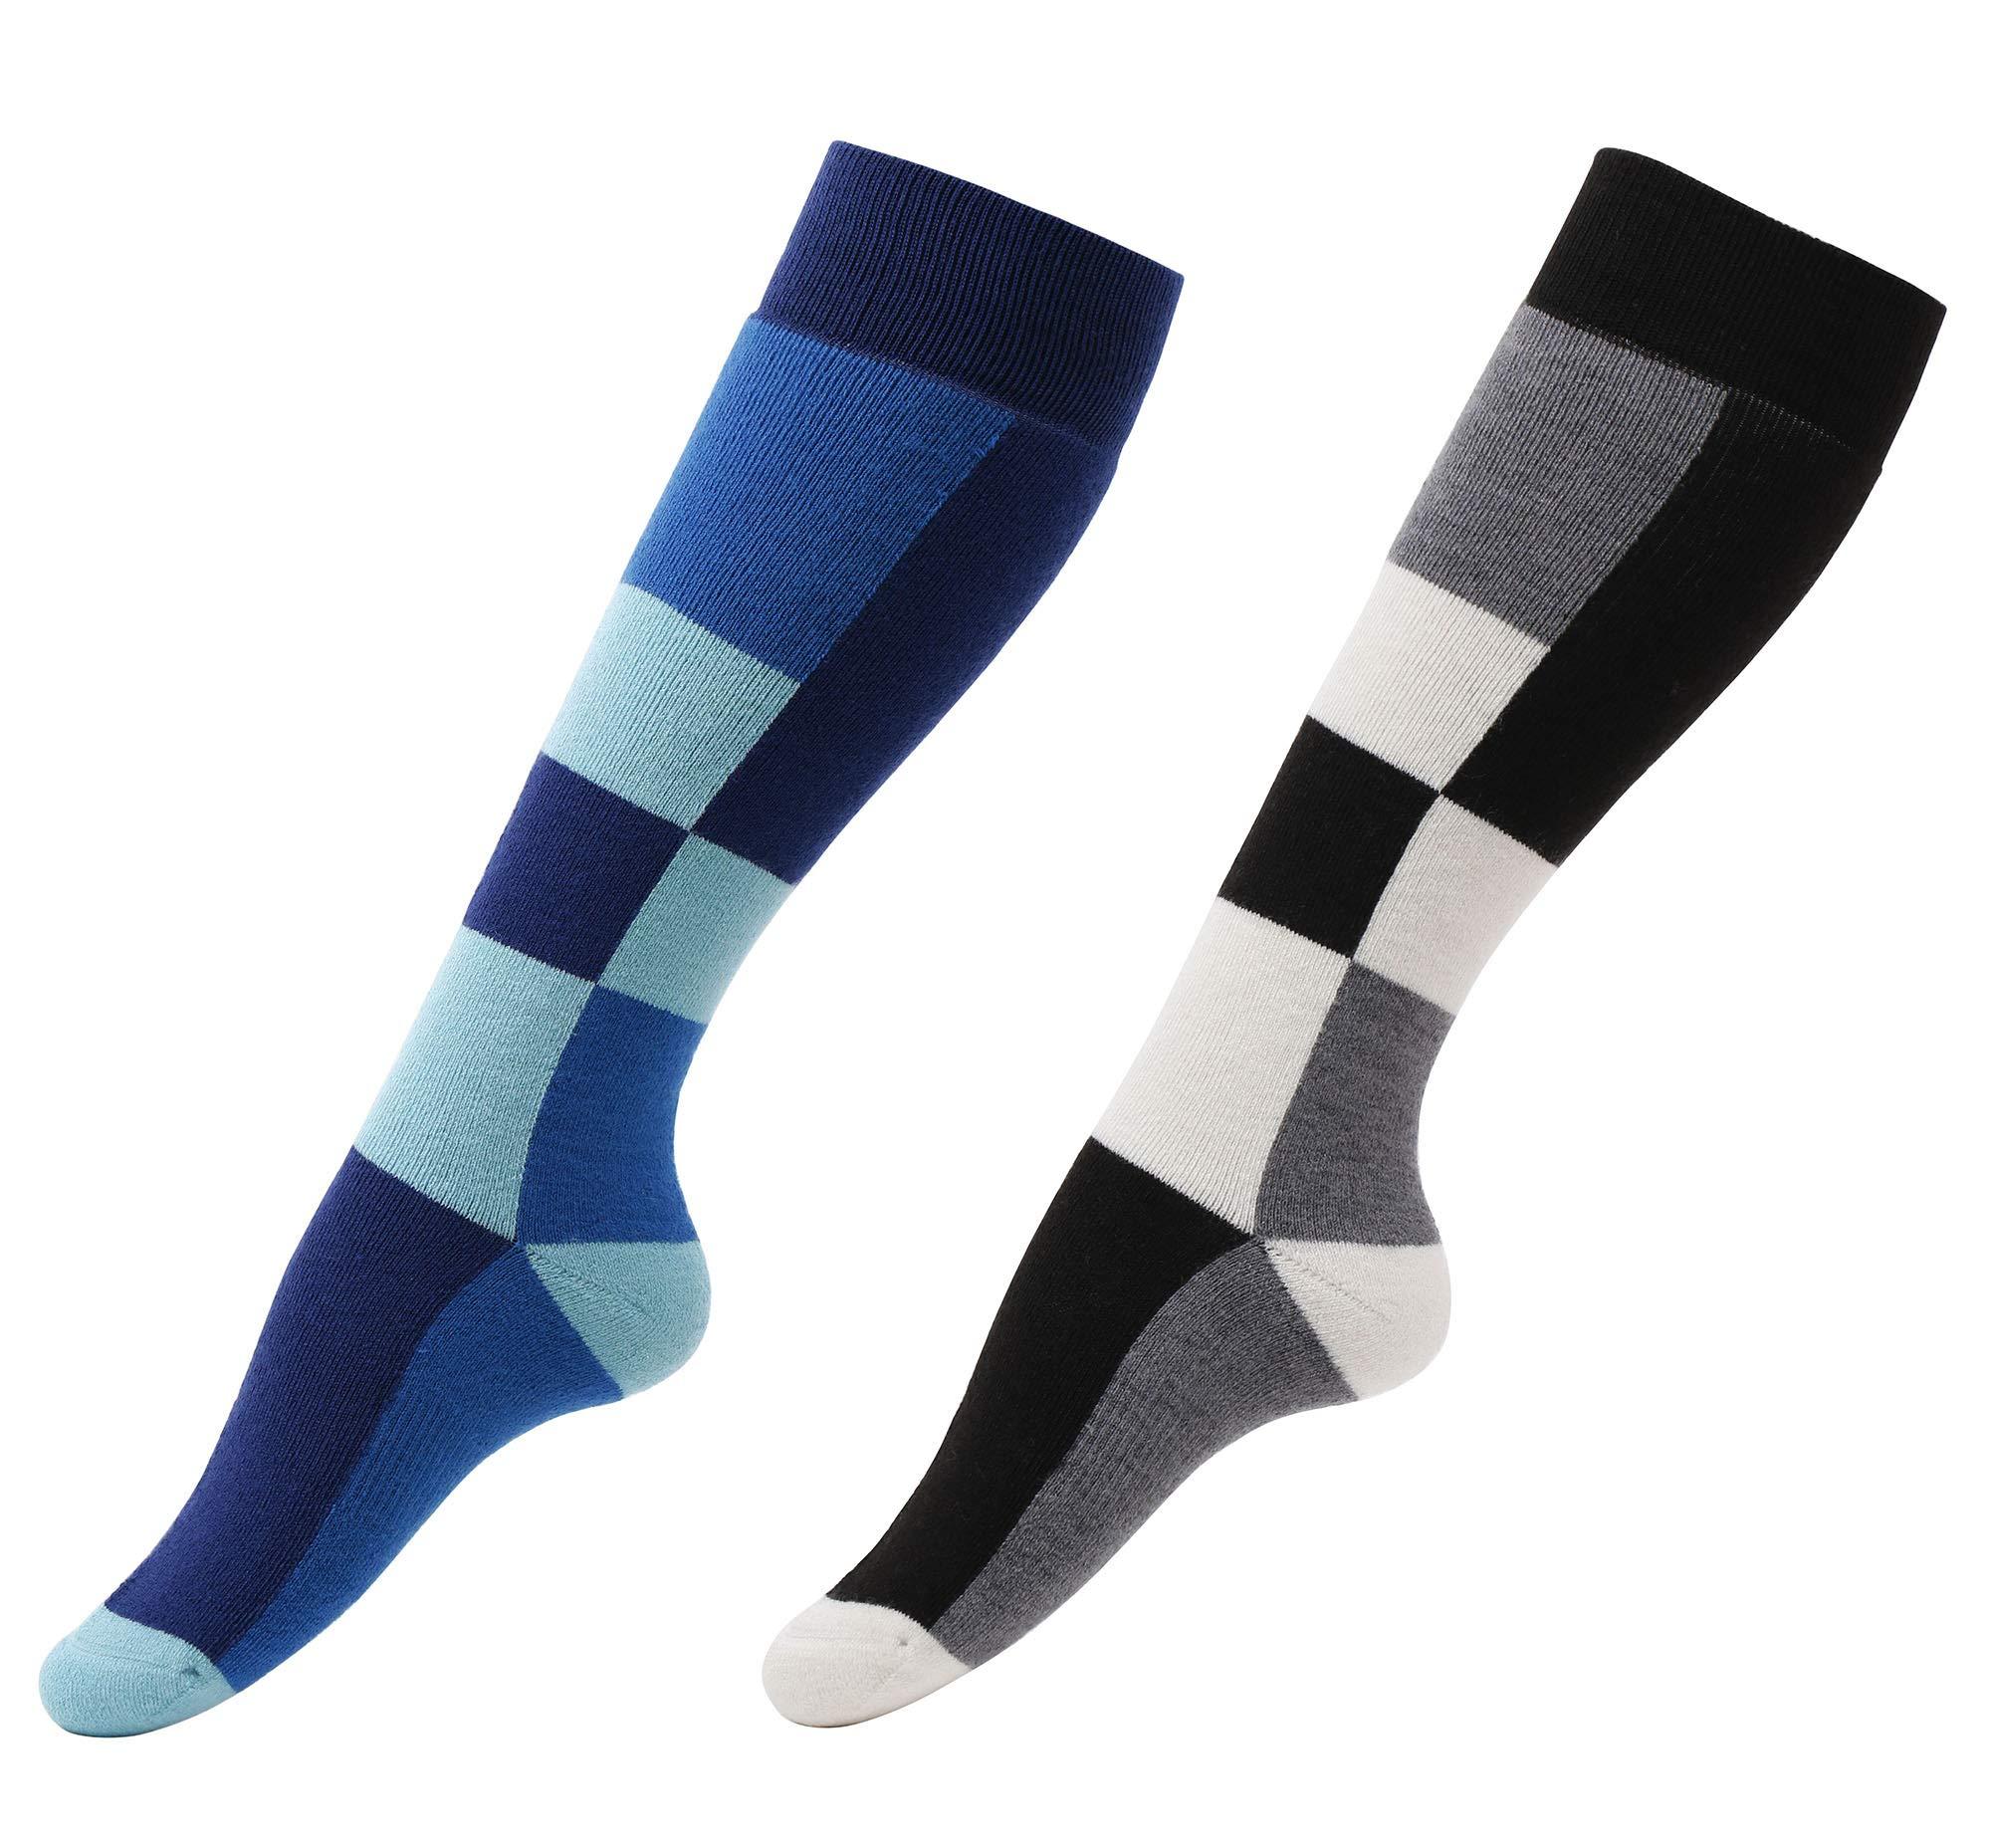 Andorra Women's High-performance Merino Wool Ultra Light Pattern Socks